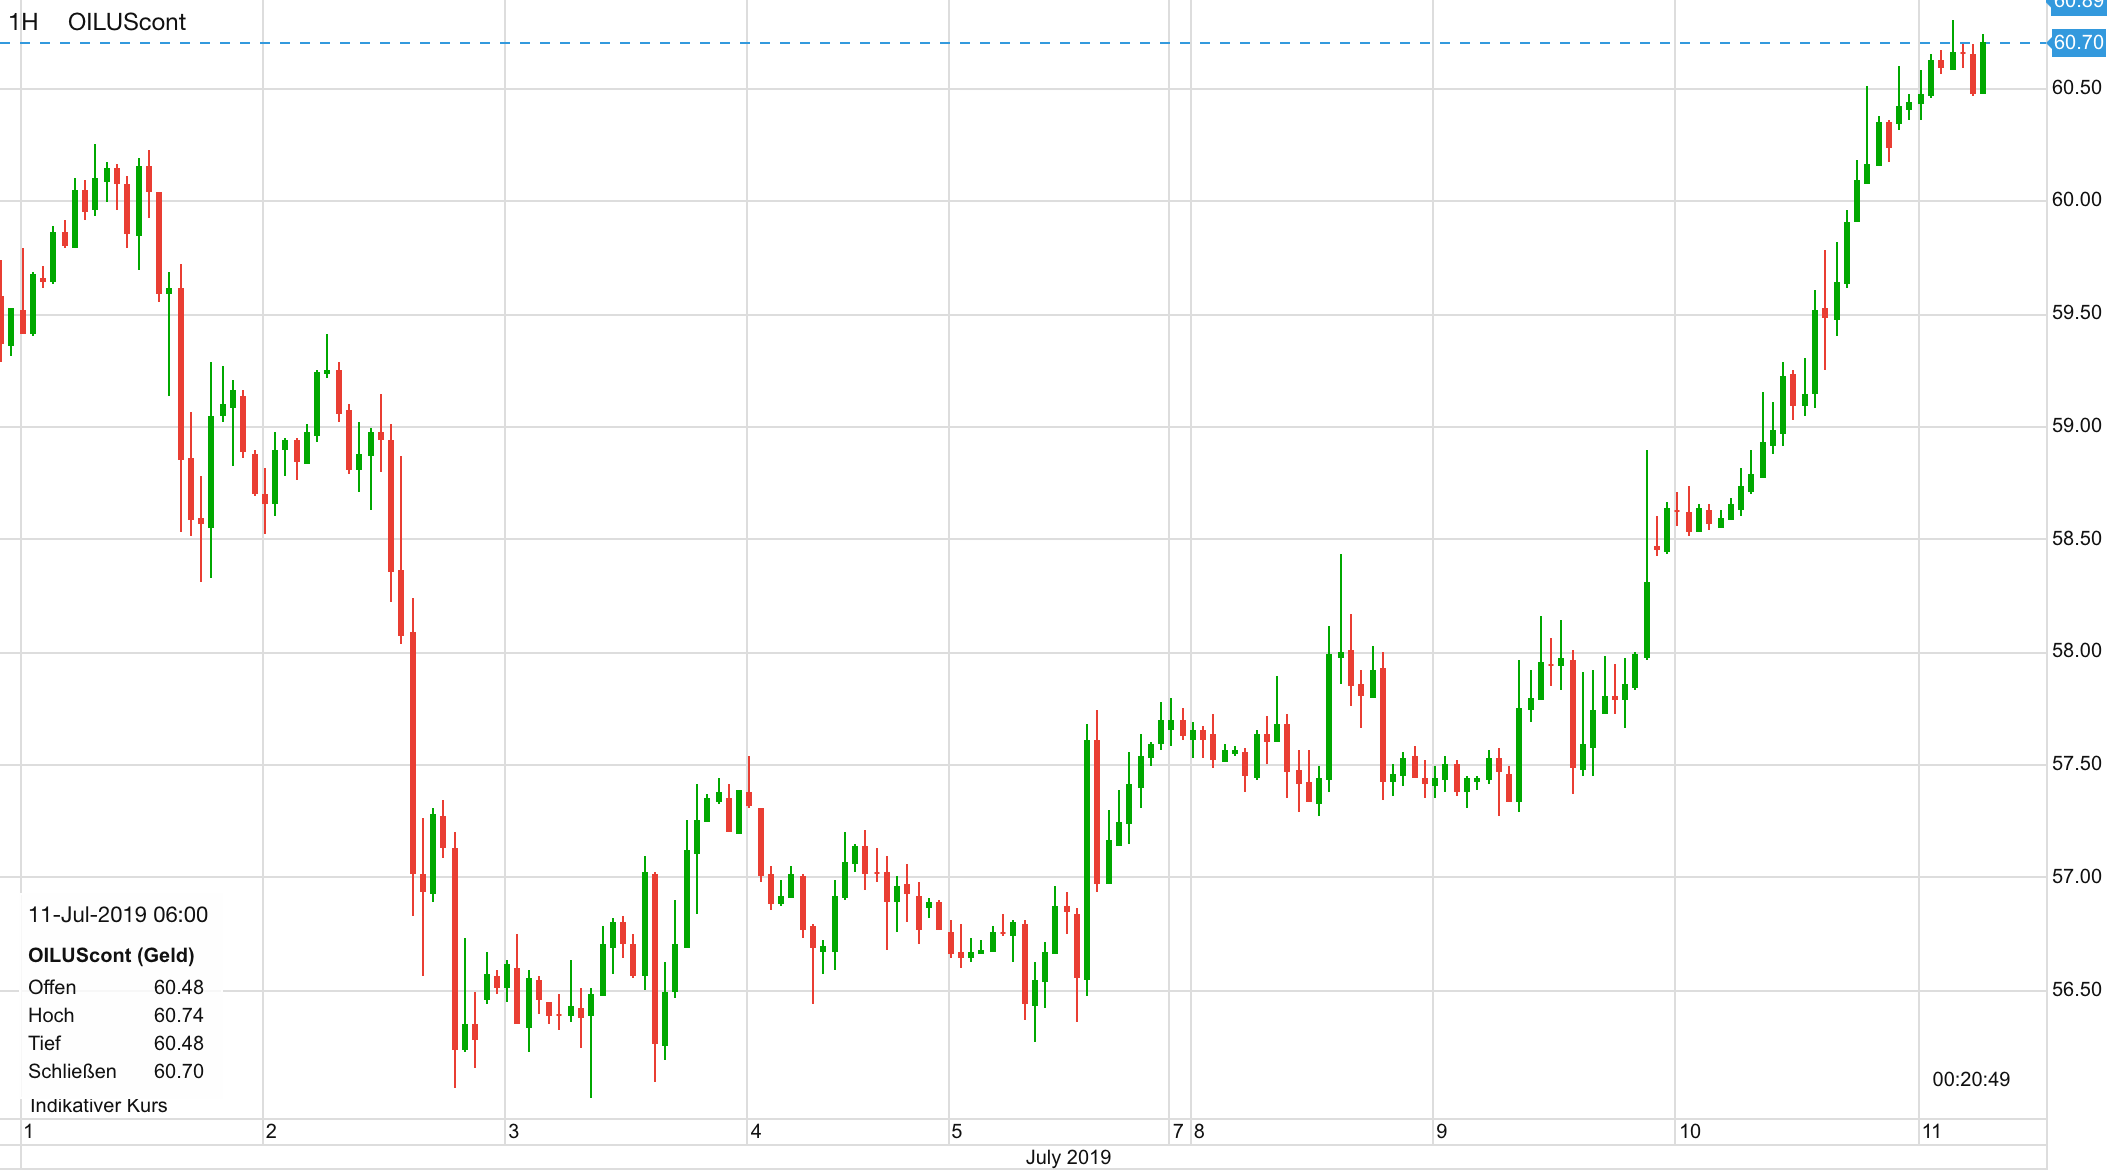 Ölpreis WTI seit dem 1. Juli